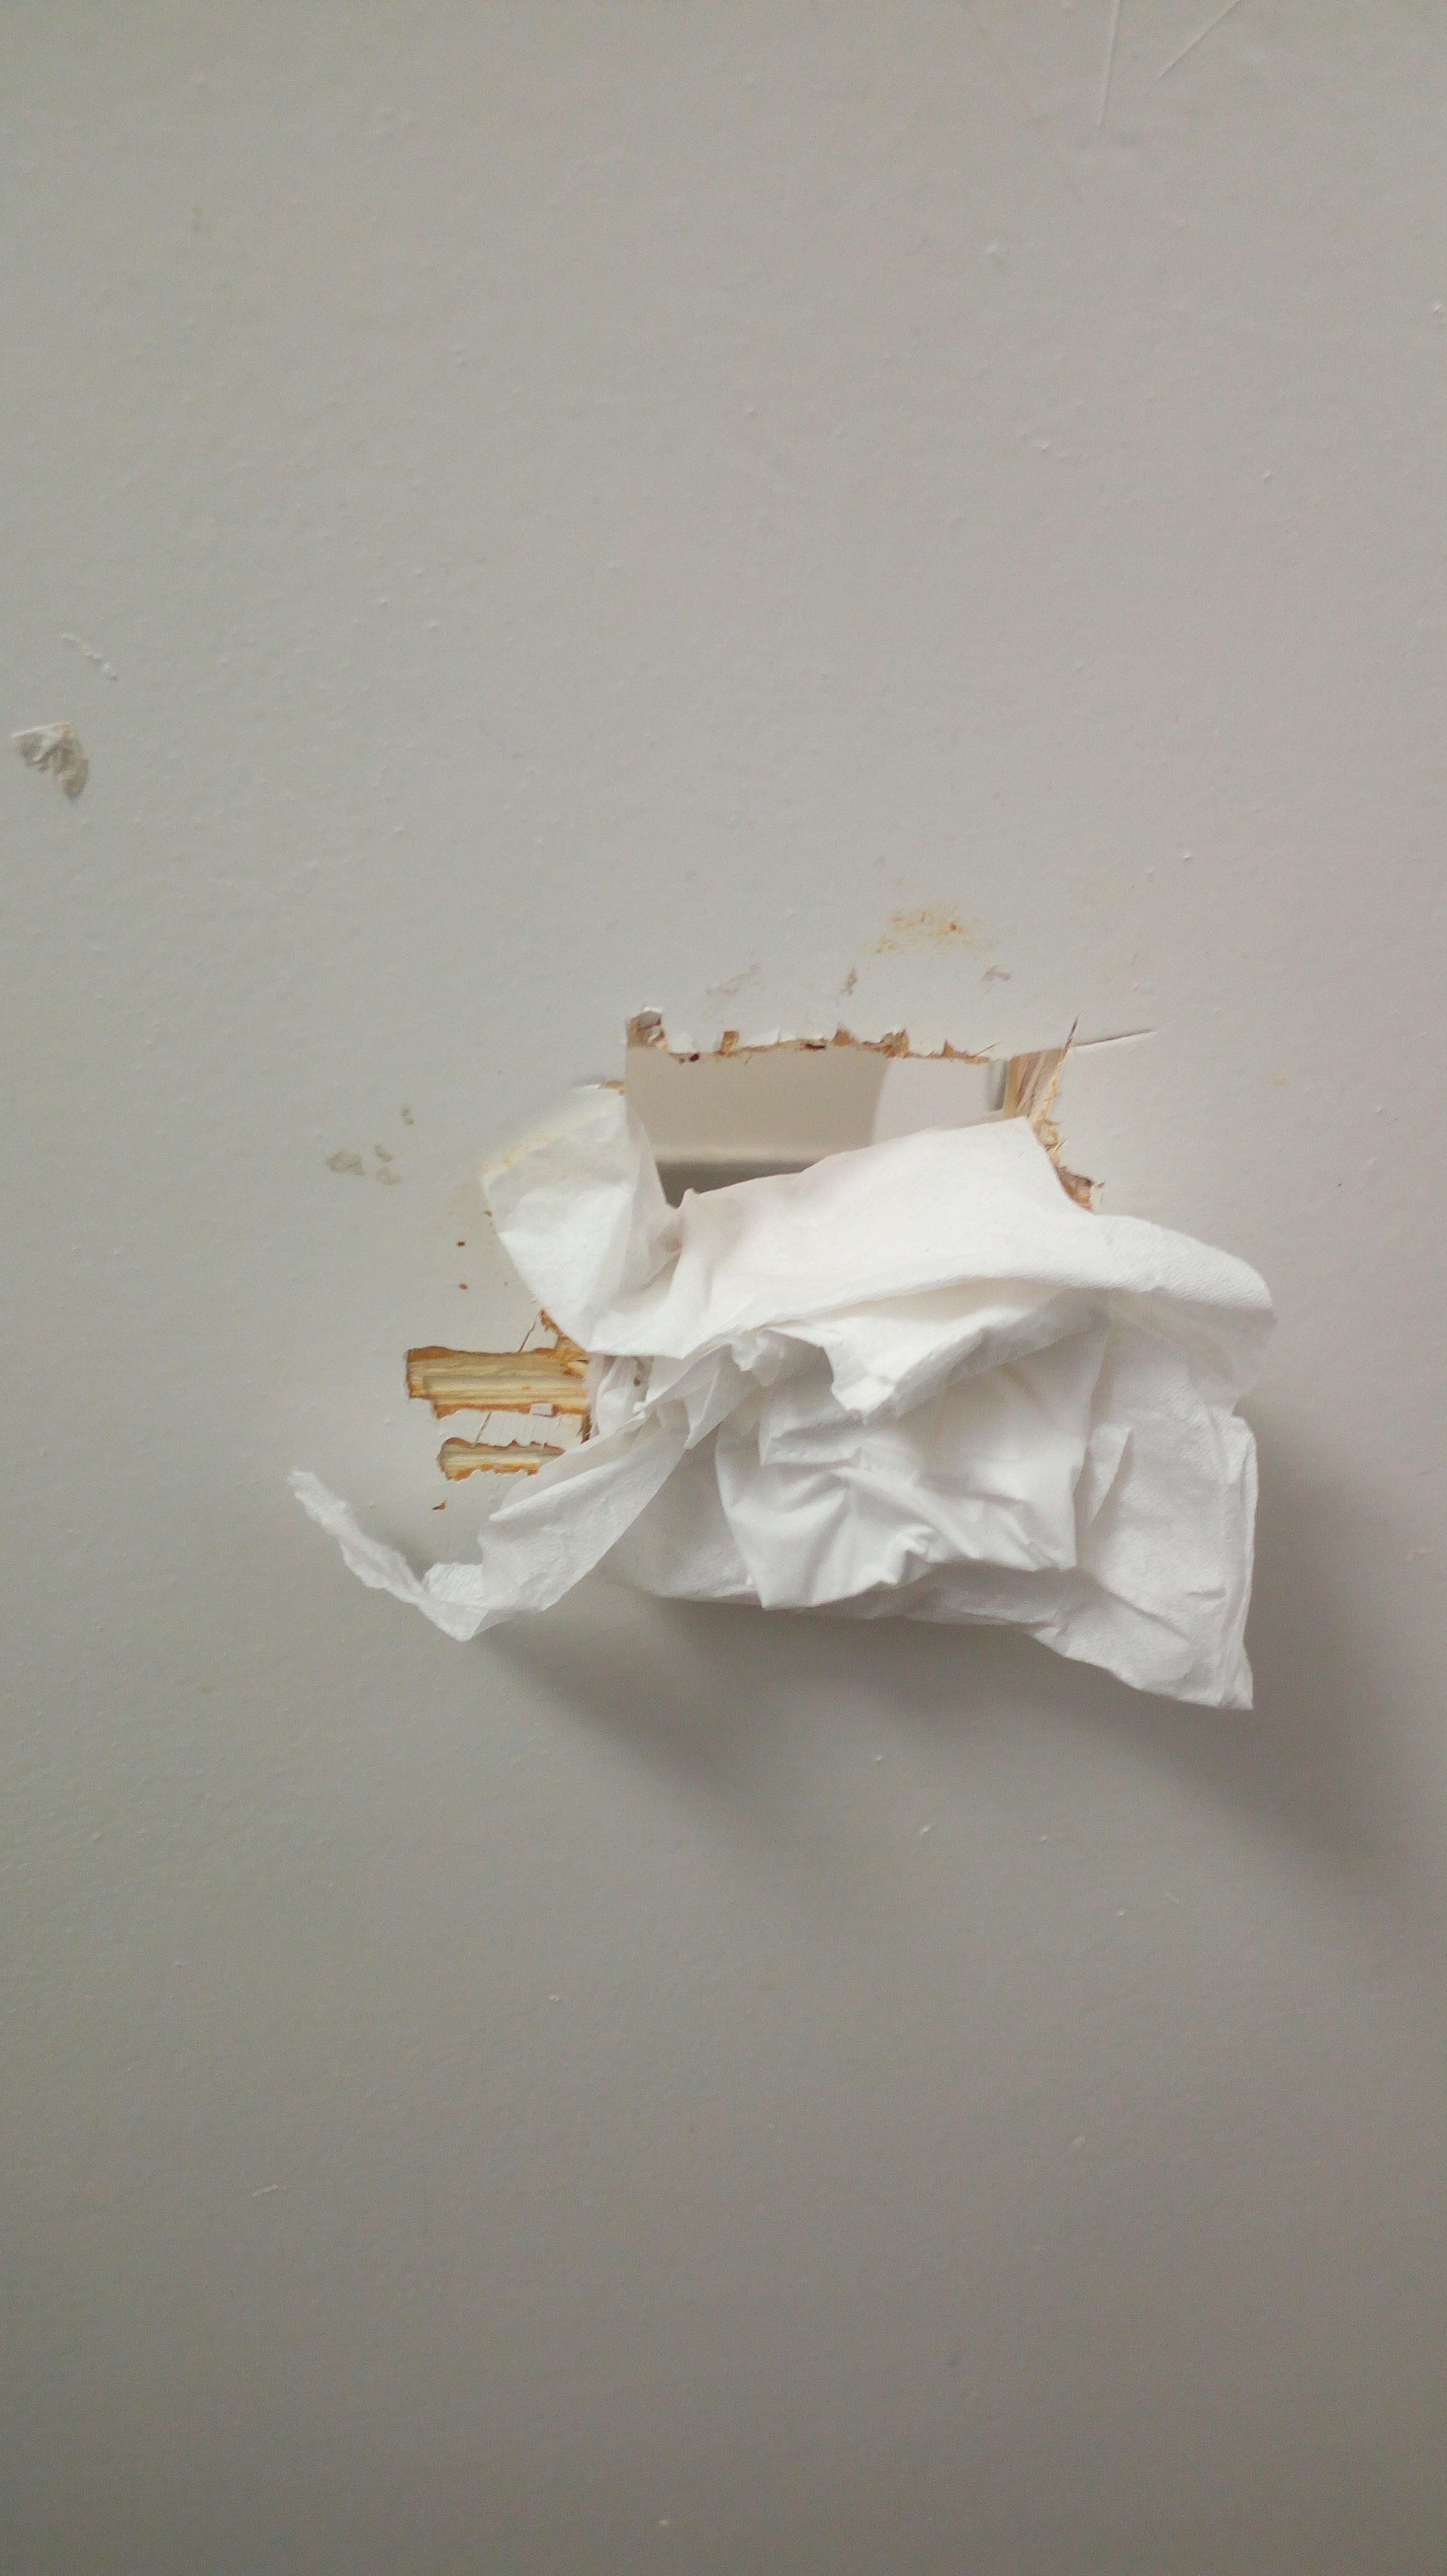 Glory hole tissue paper photo 902